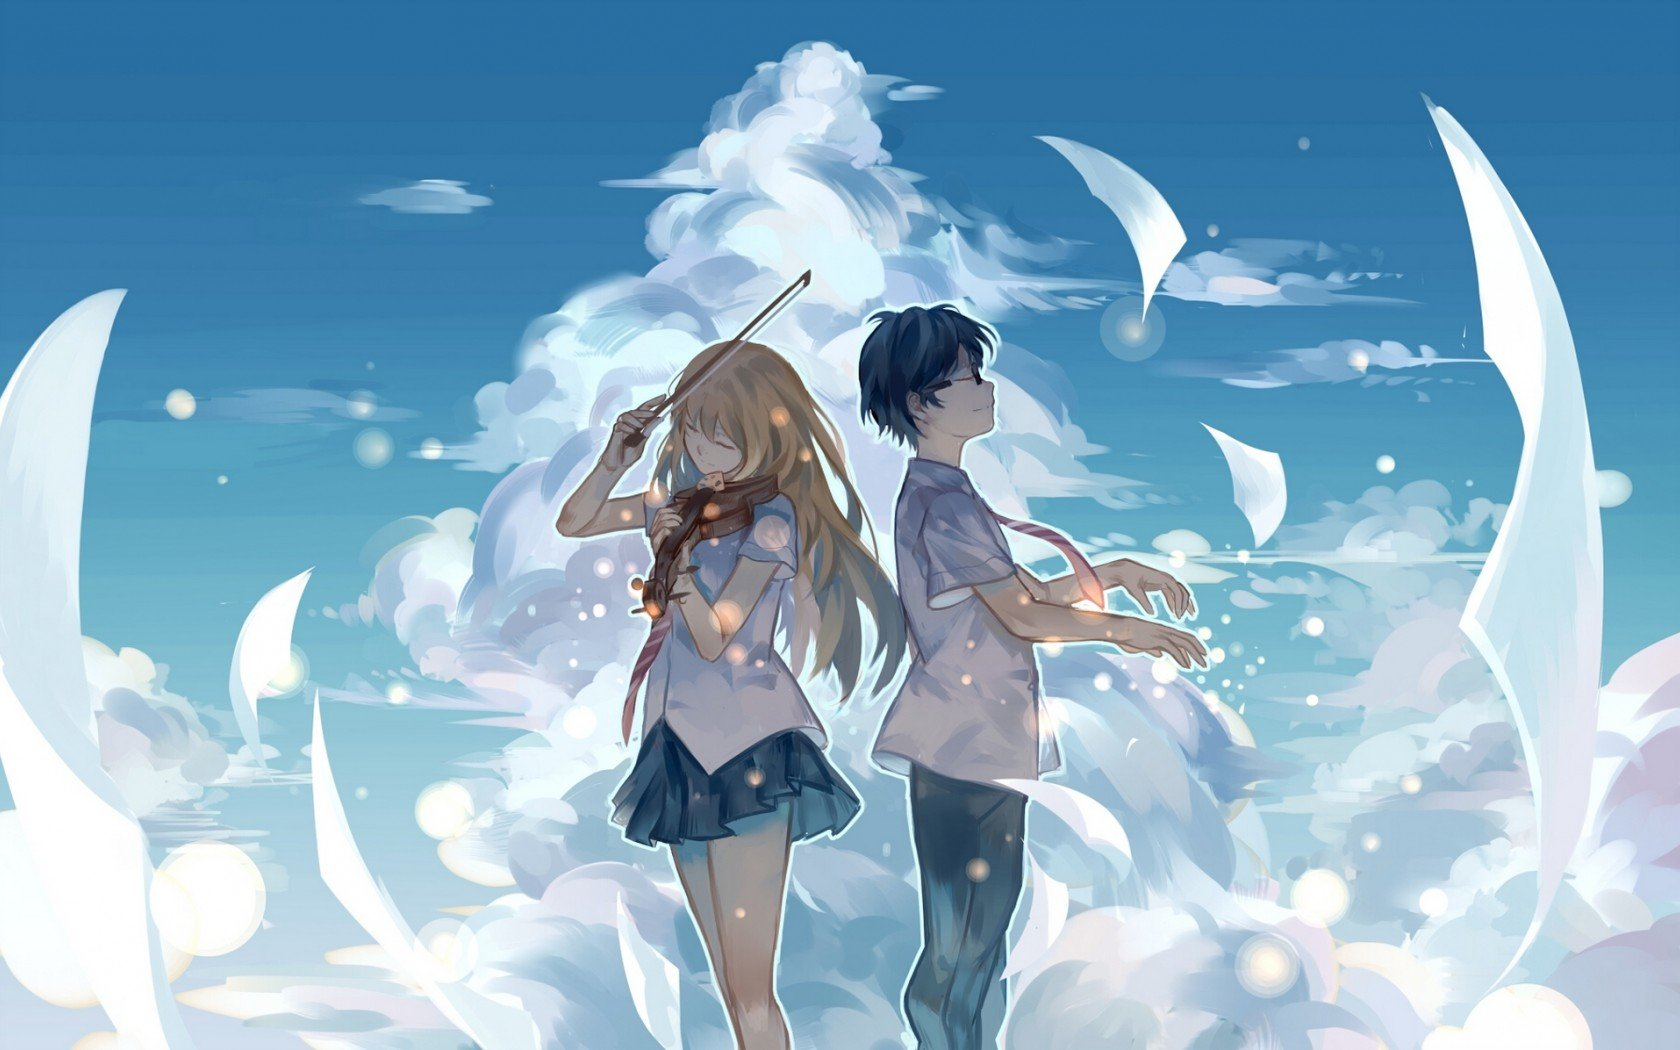 Art Violin Anime Sky Couple Notes Music Wallpaper